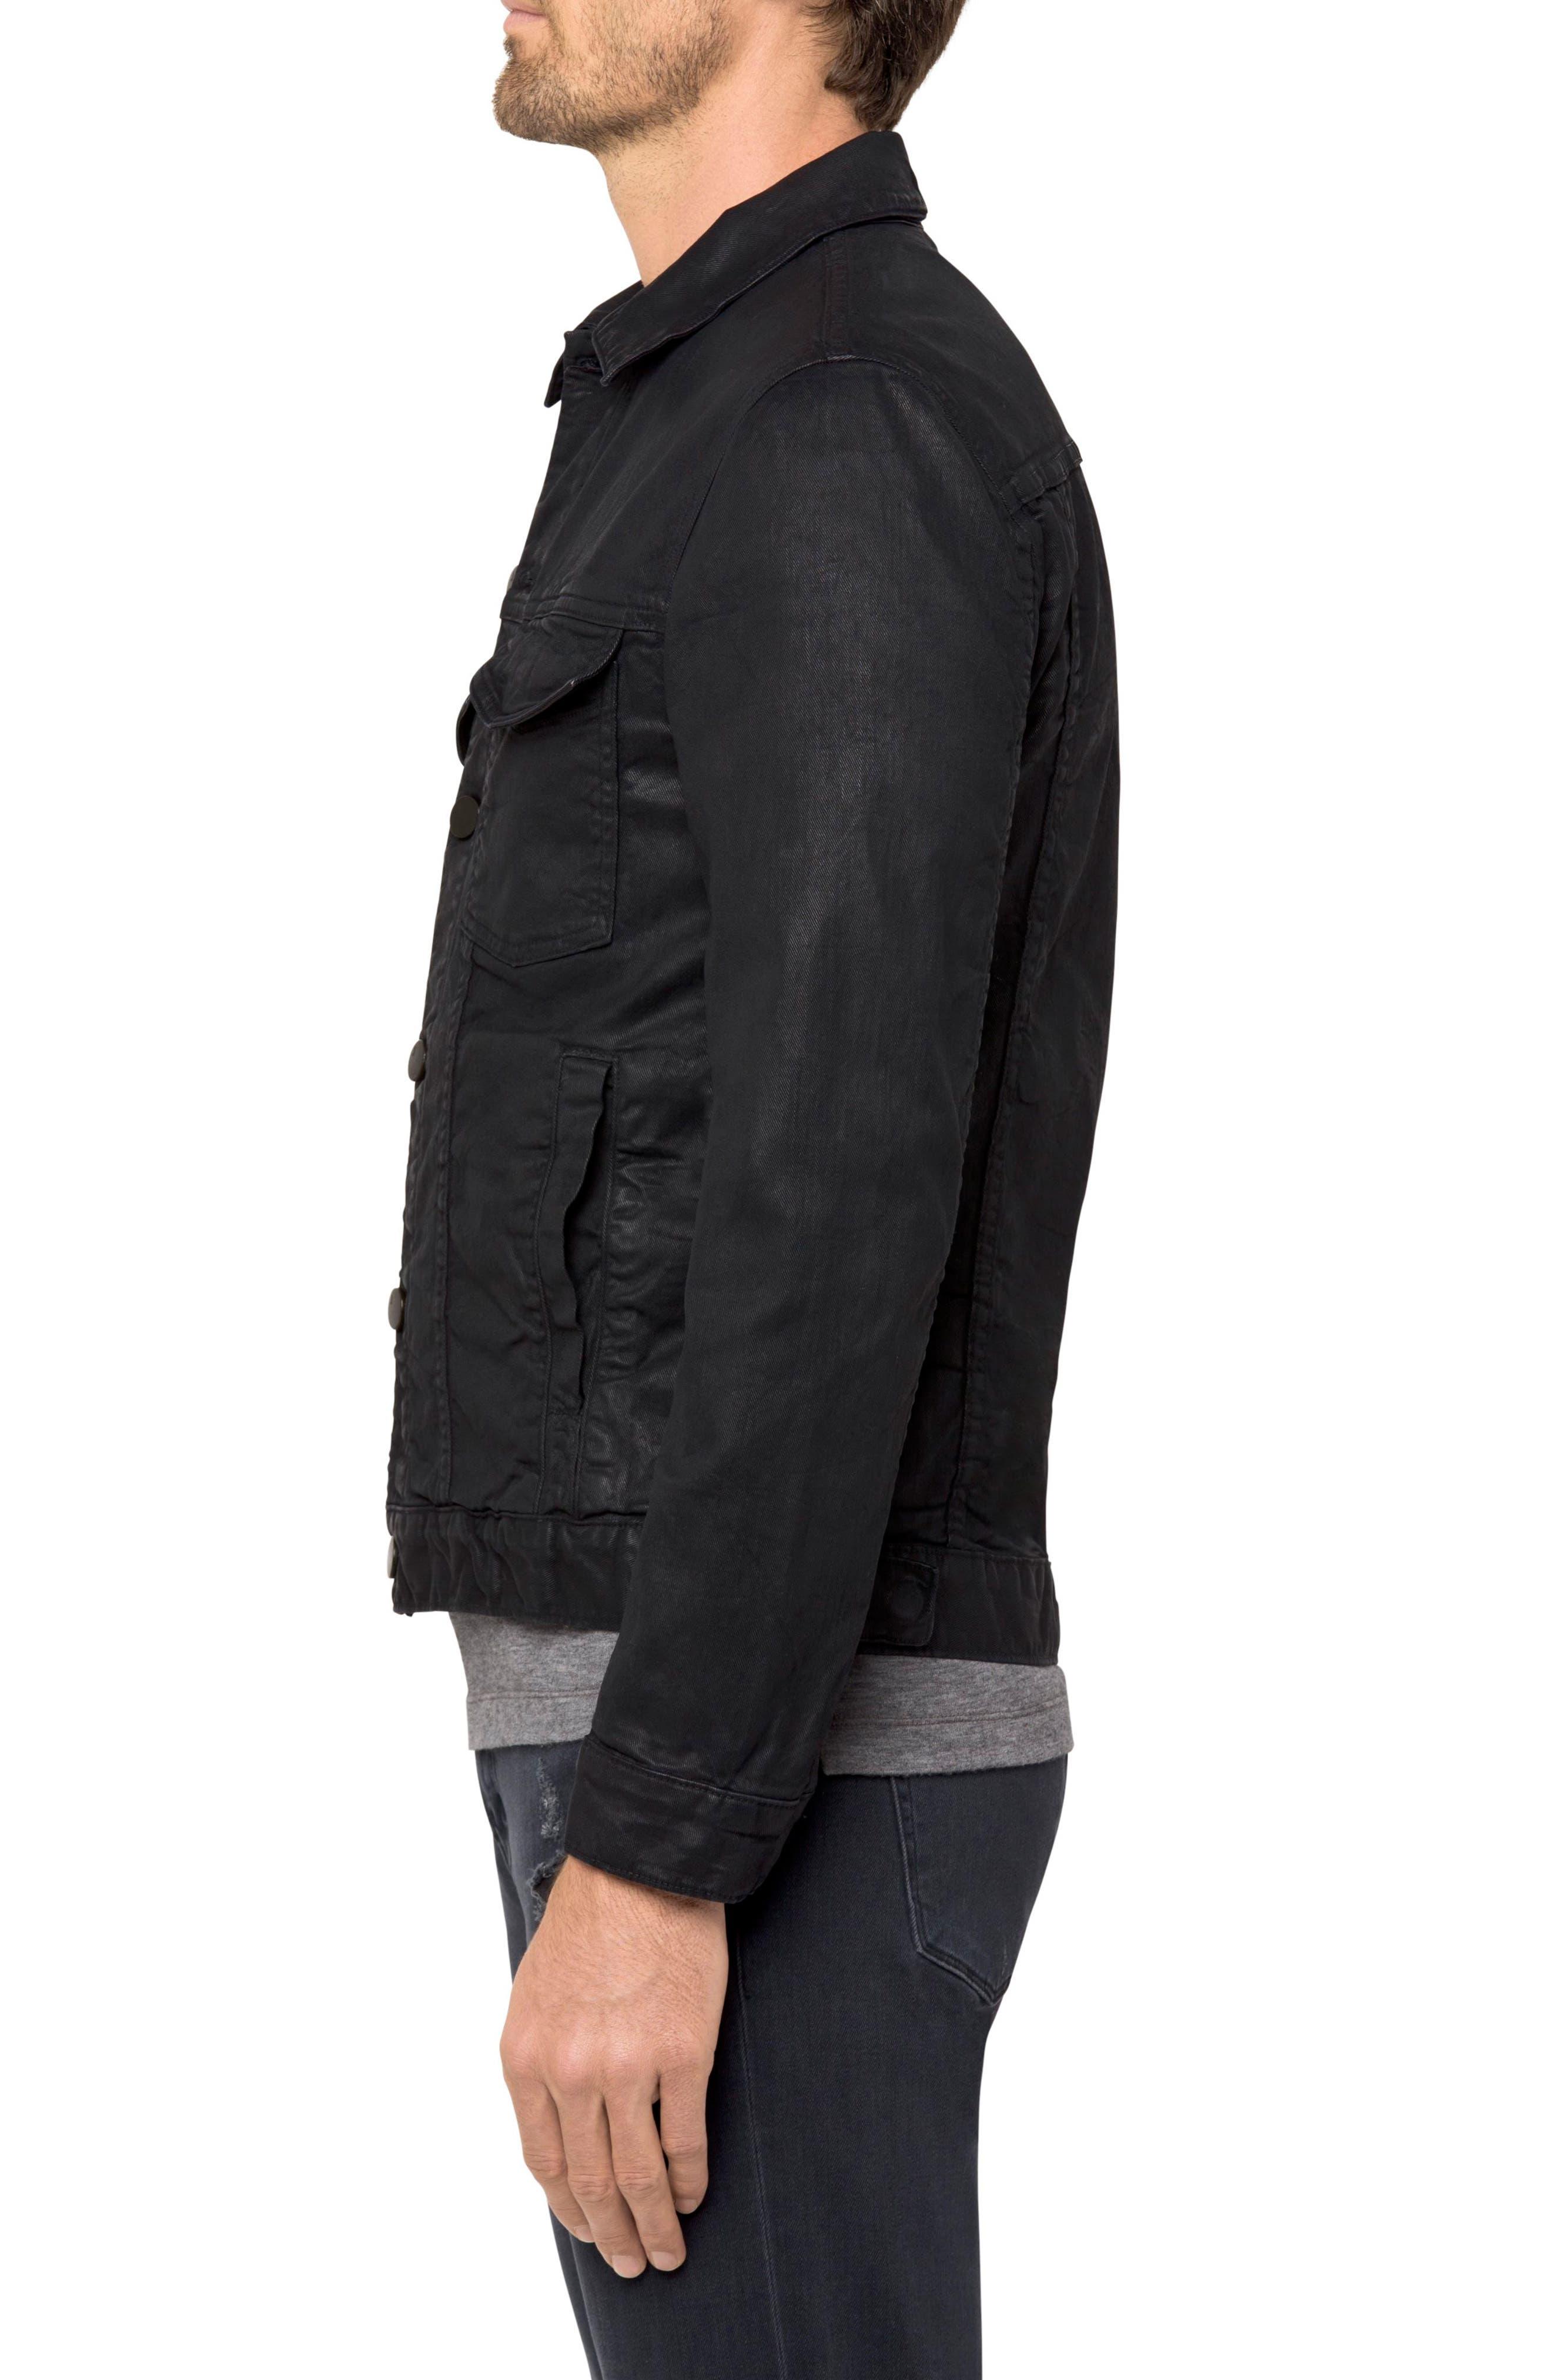 Gorn Denim Jacket,                             Alternate thumbnail 3, color,                             001